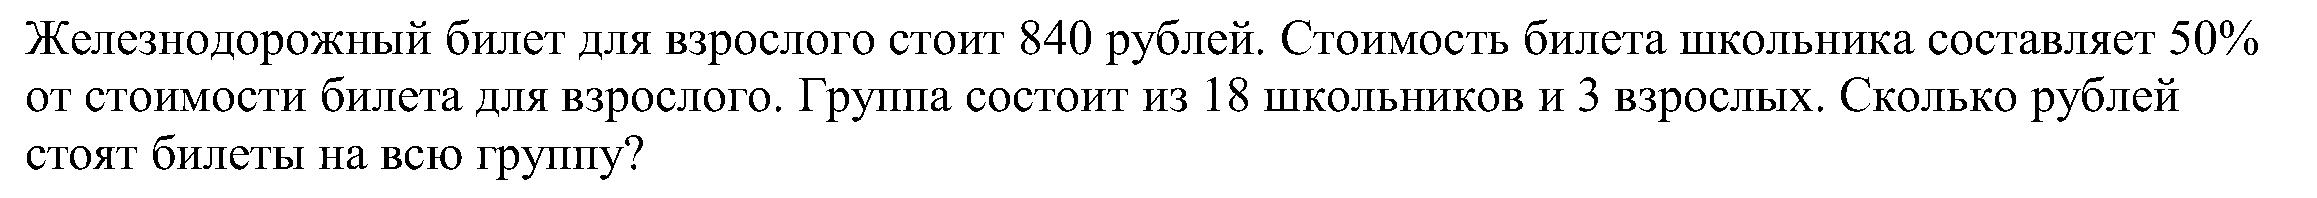 hello_html_638b8723.png